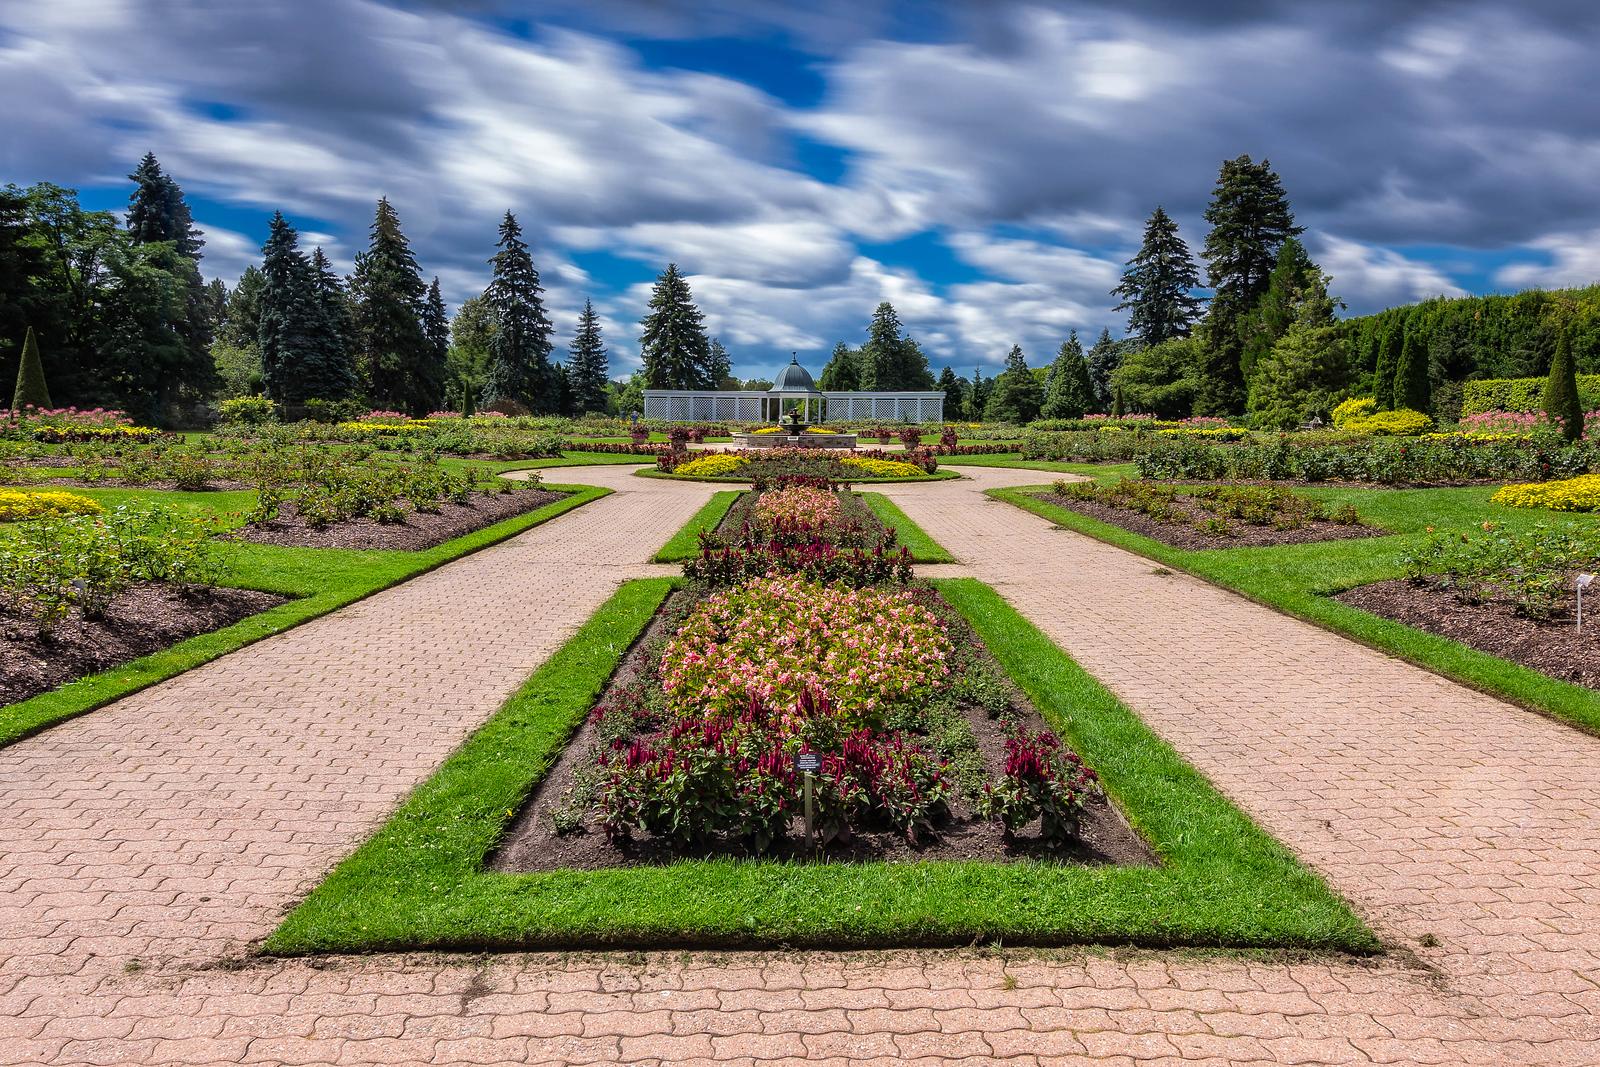 Botanical Gardens in Niagara Falls, Canada